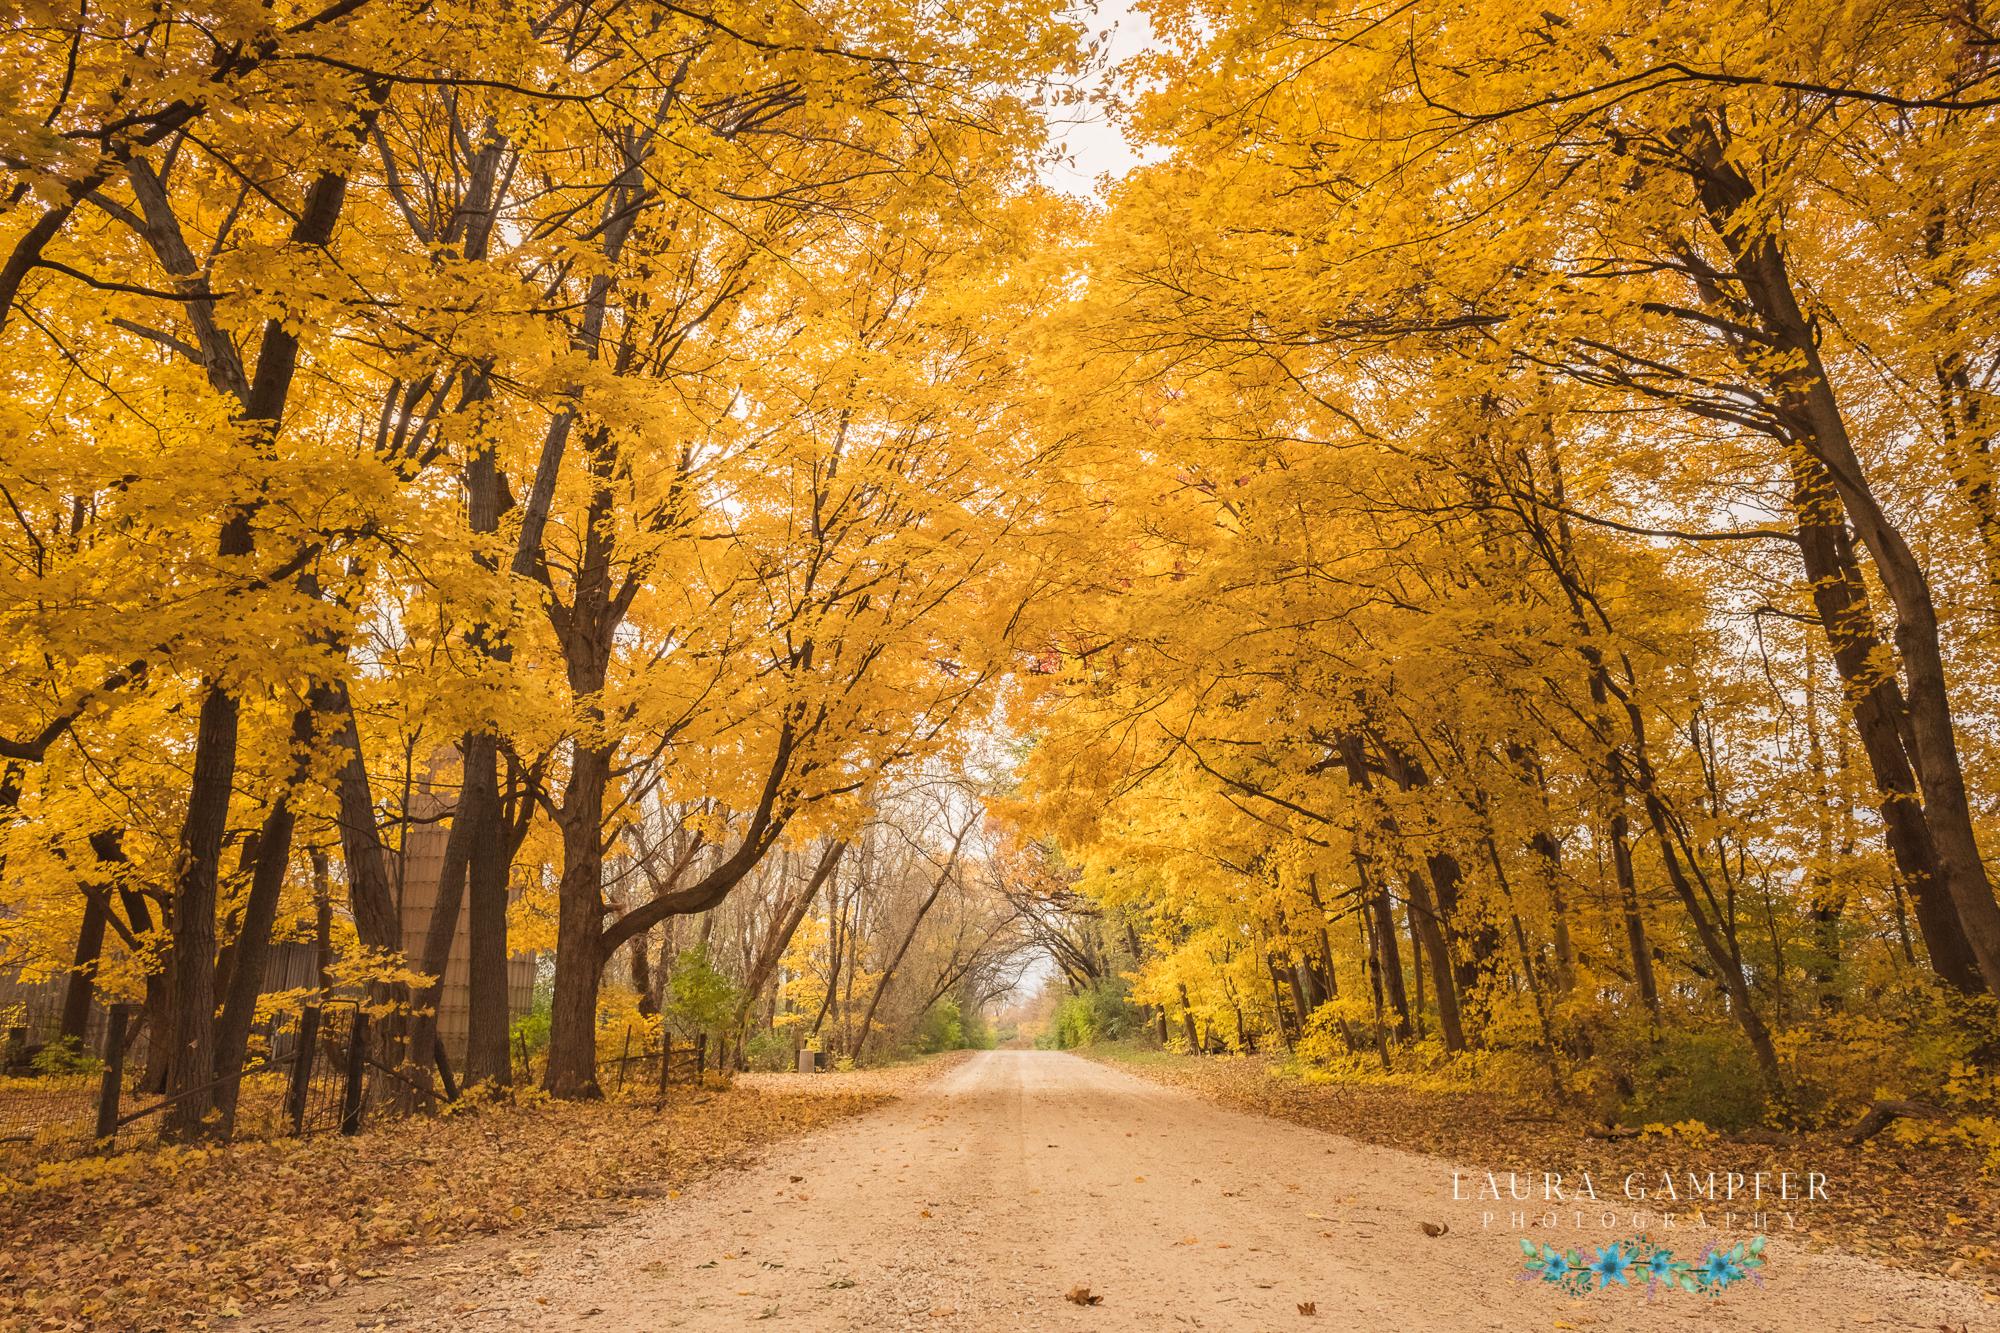 kane county rustic road, elburn illinois, laura gampfer photography